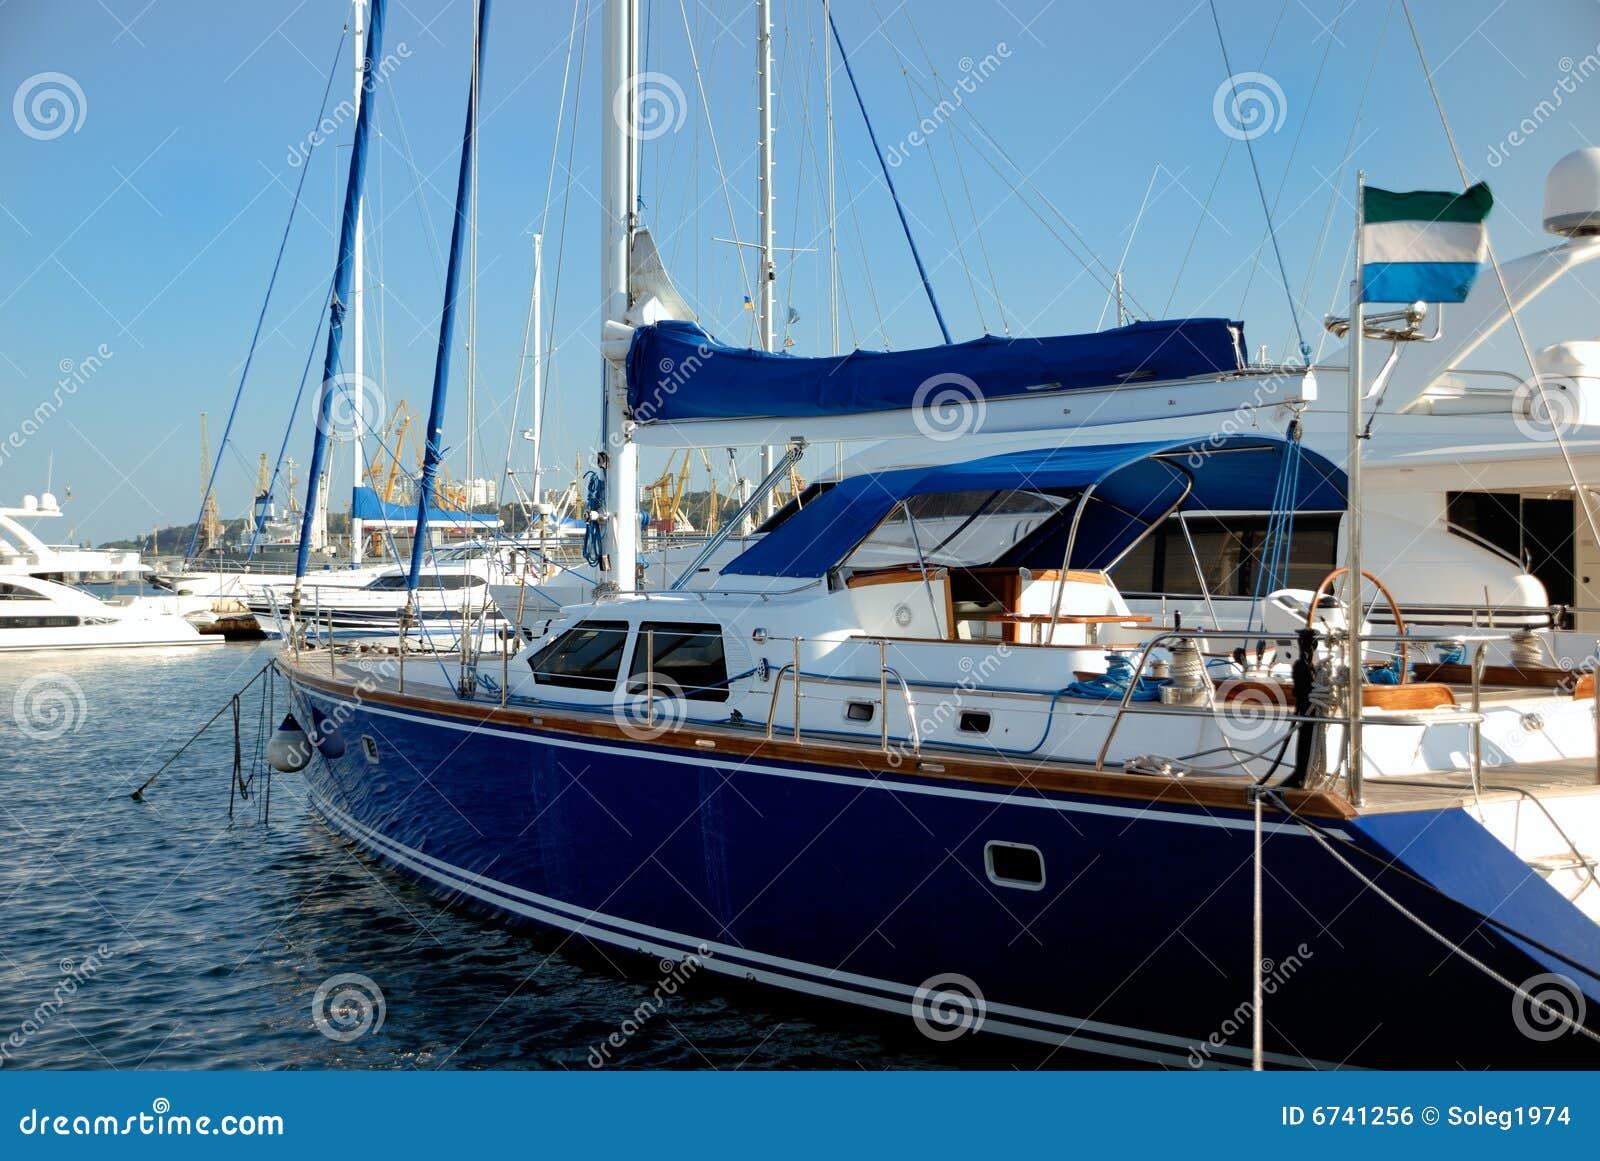 dark blue sailing yacht on an anchor stock photo